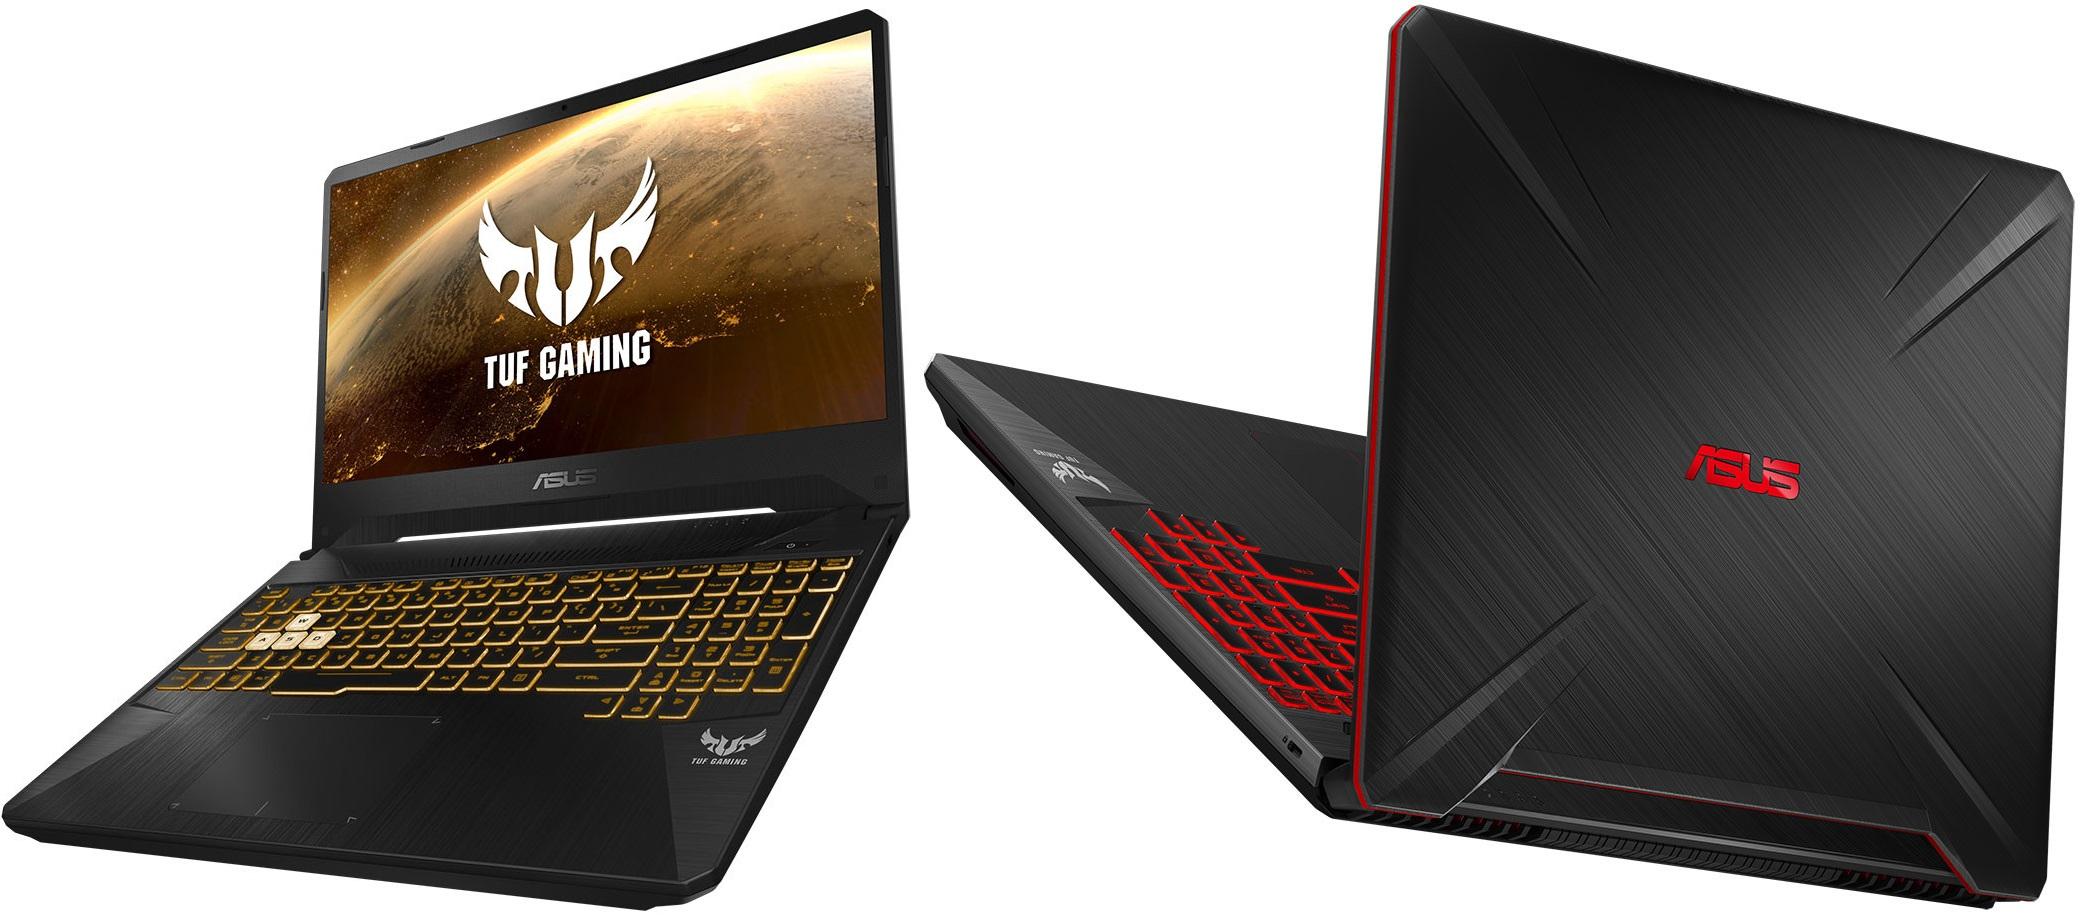 0942c3f37bd6 Asus TUF Gaming FX505DY y FX705DY: Portátiles gaming con CPU AMD ...